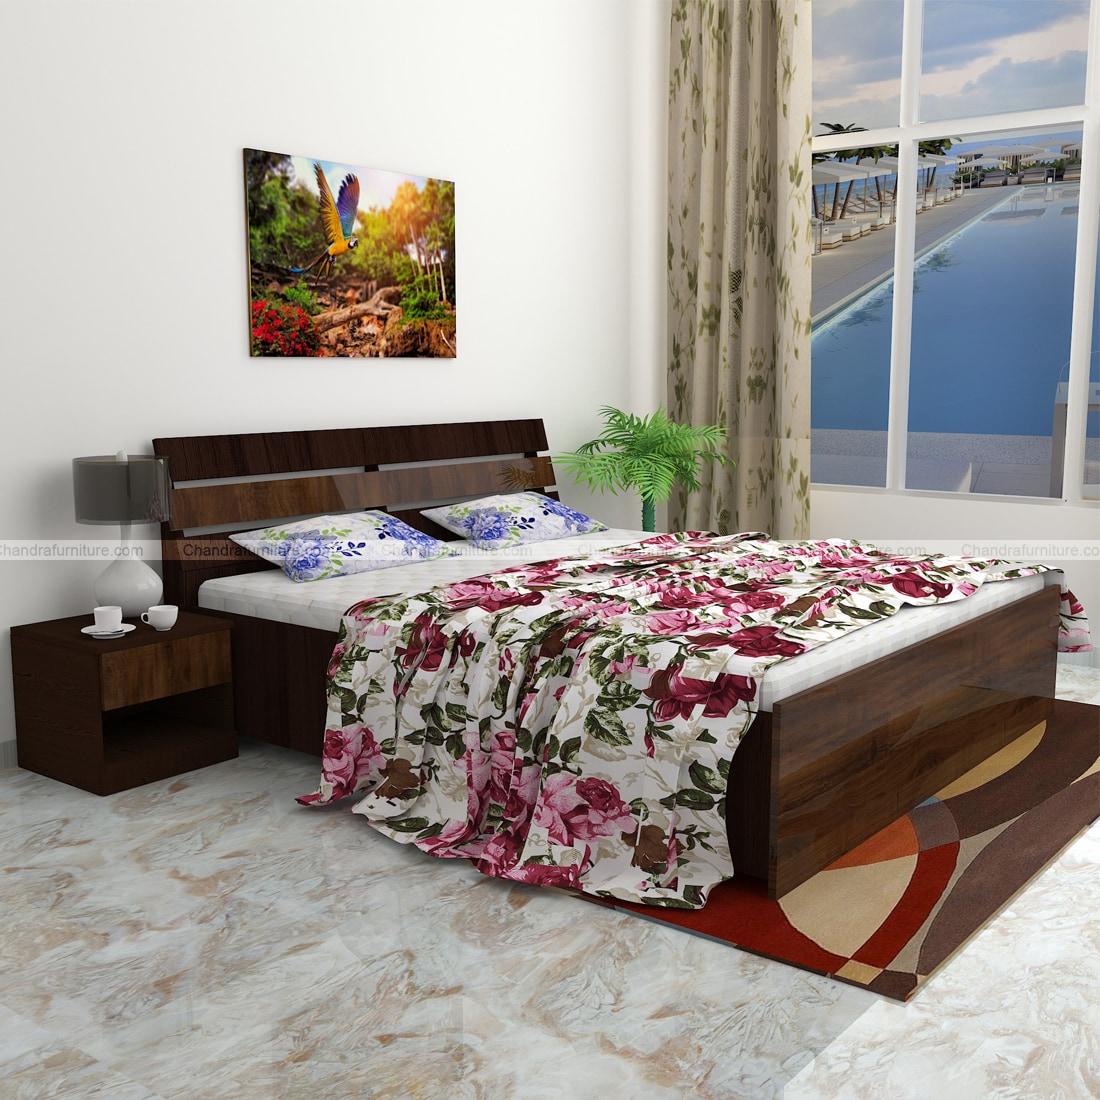 Chandra Furniture King Size Bed -60 Duke